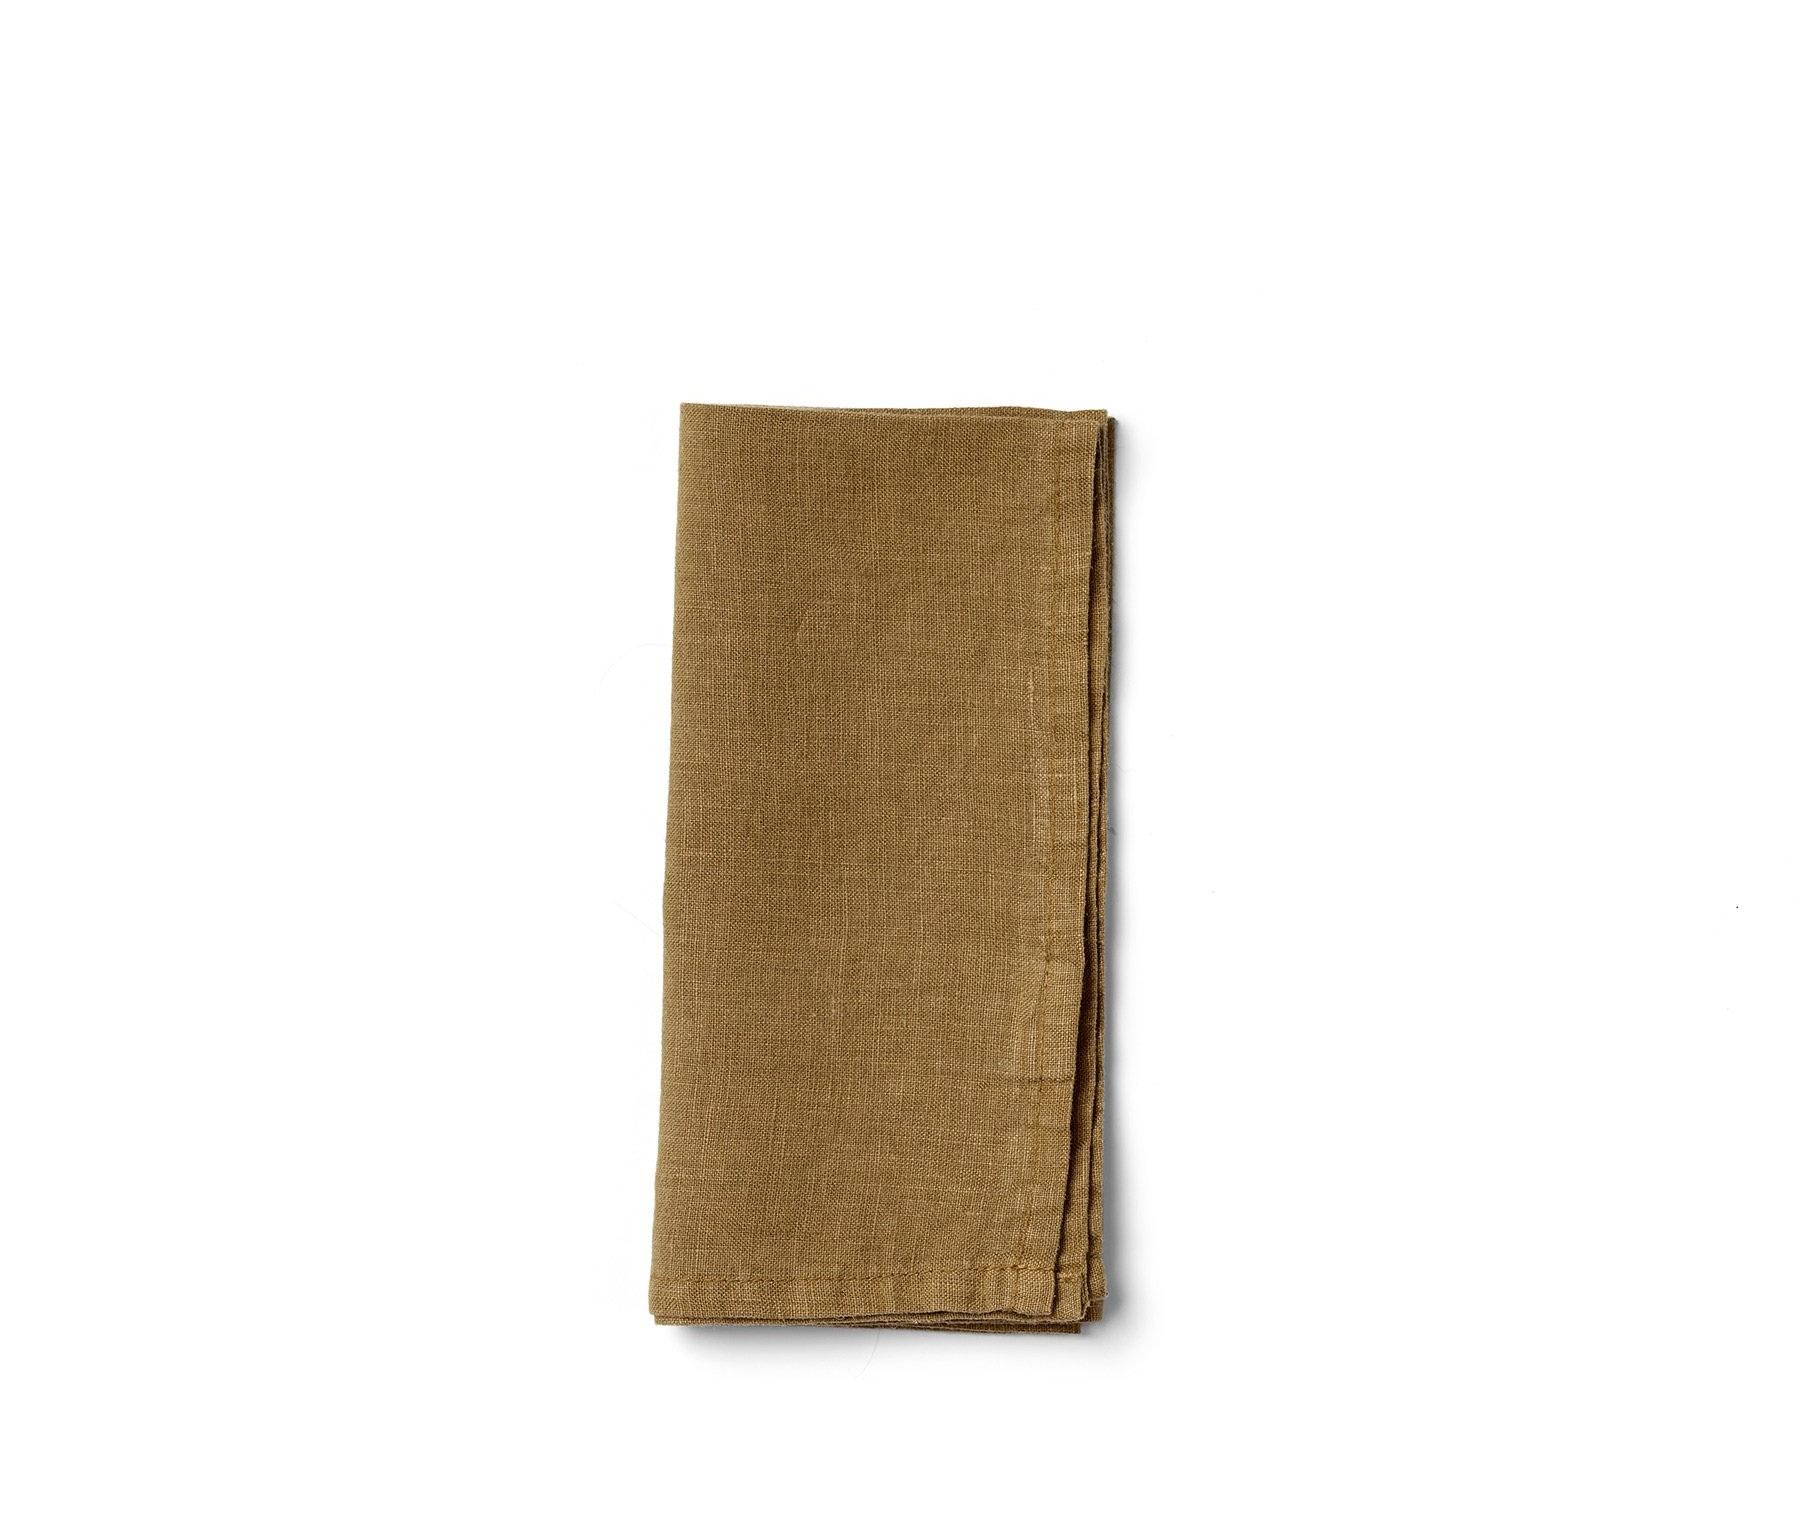 Linen Napkin; $18